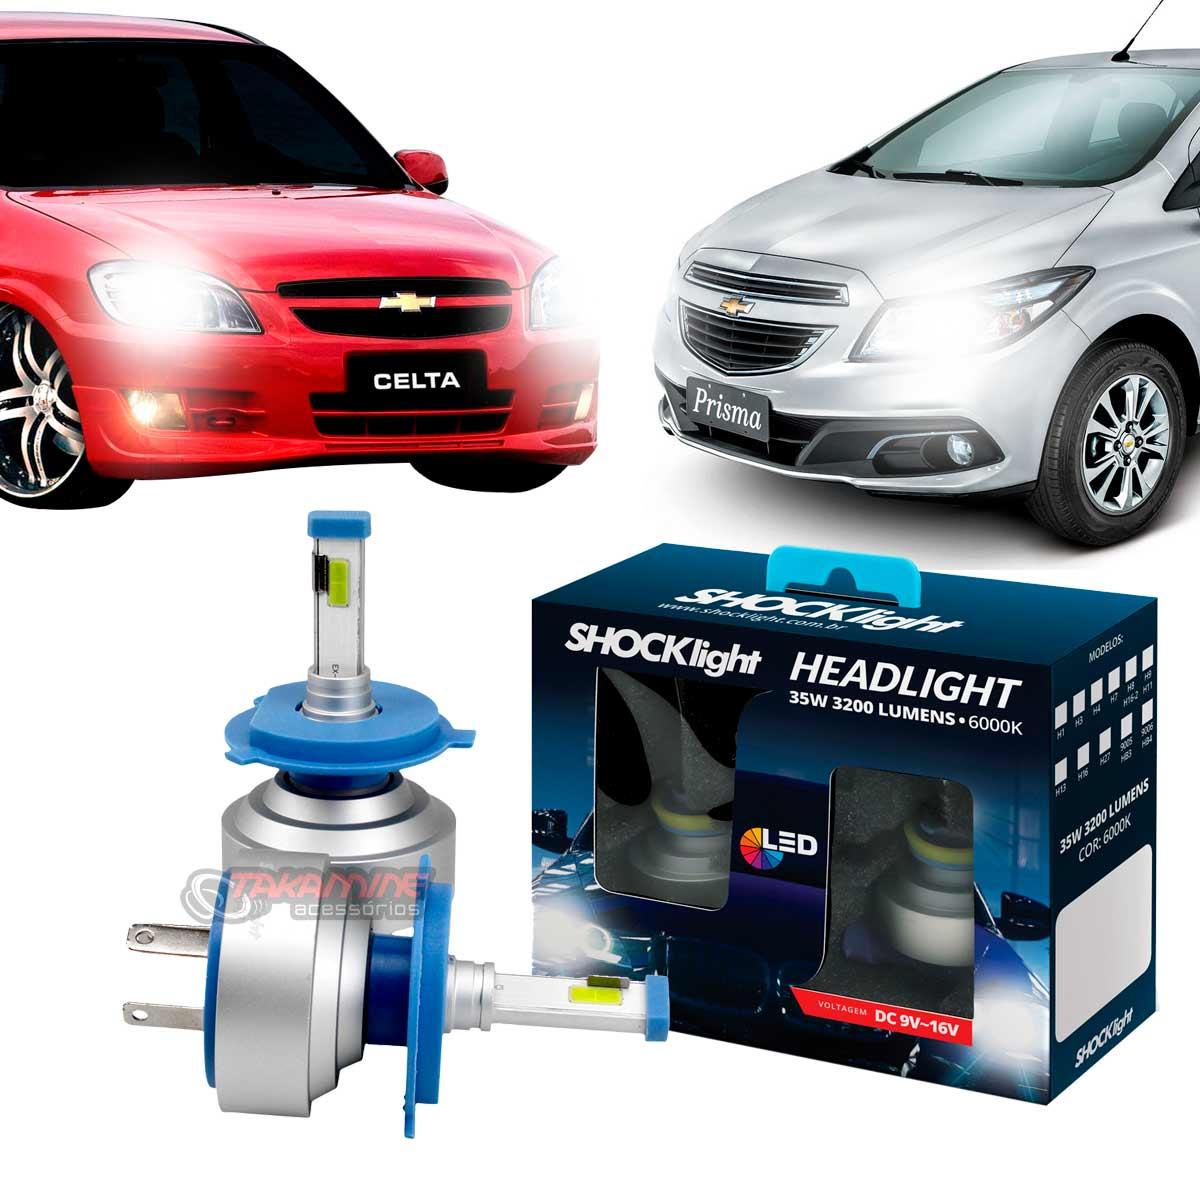 Kit LED Celta 2000 até 2015 Prisma 2006 até 2020 tipo xenon modelo H4 35W encaixe original plug & play New Headlight